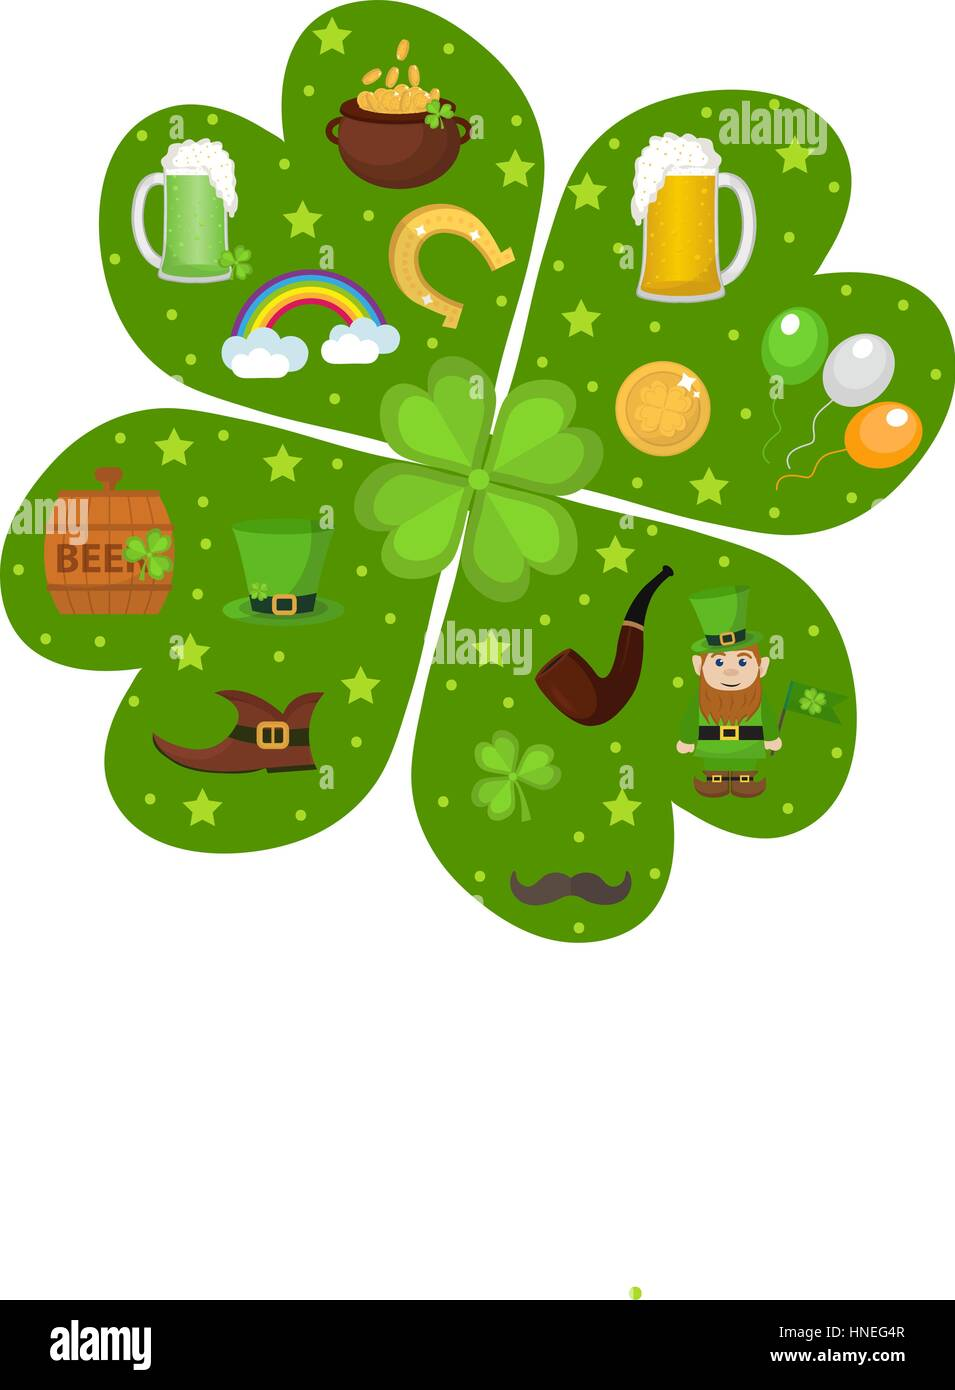 beer clover ireland symbols irish gold holiday smoke